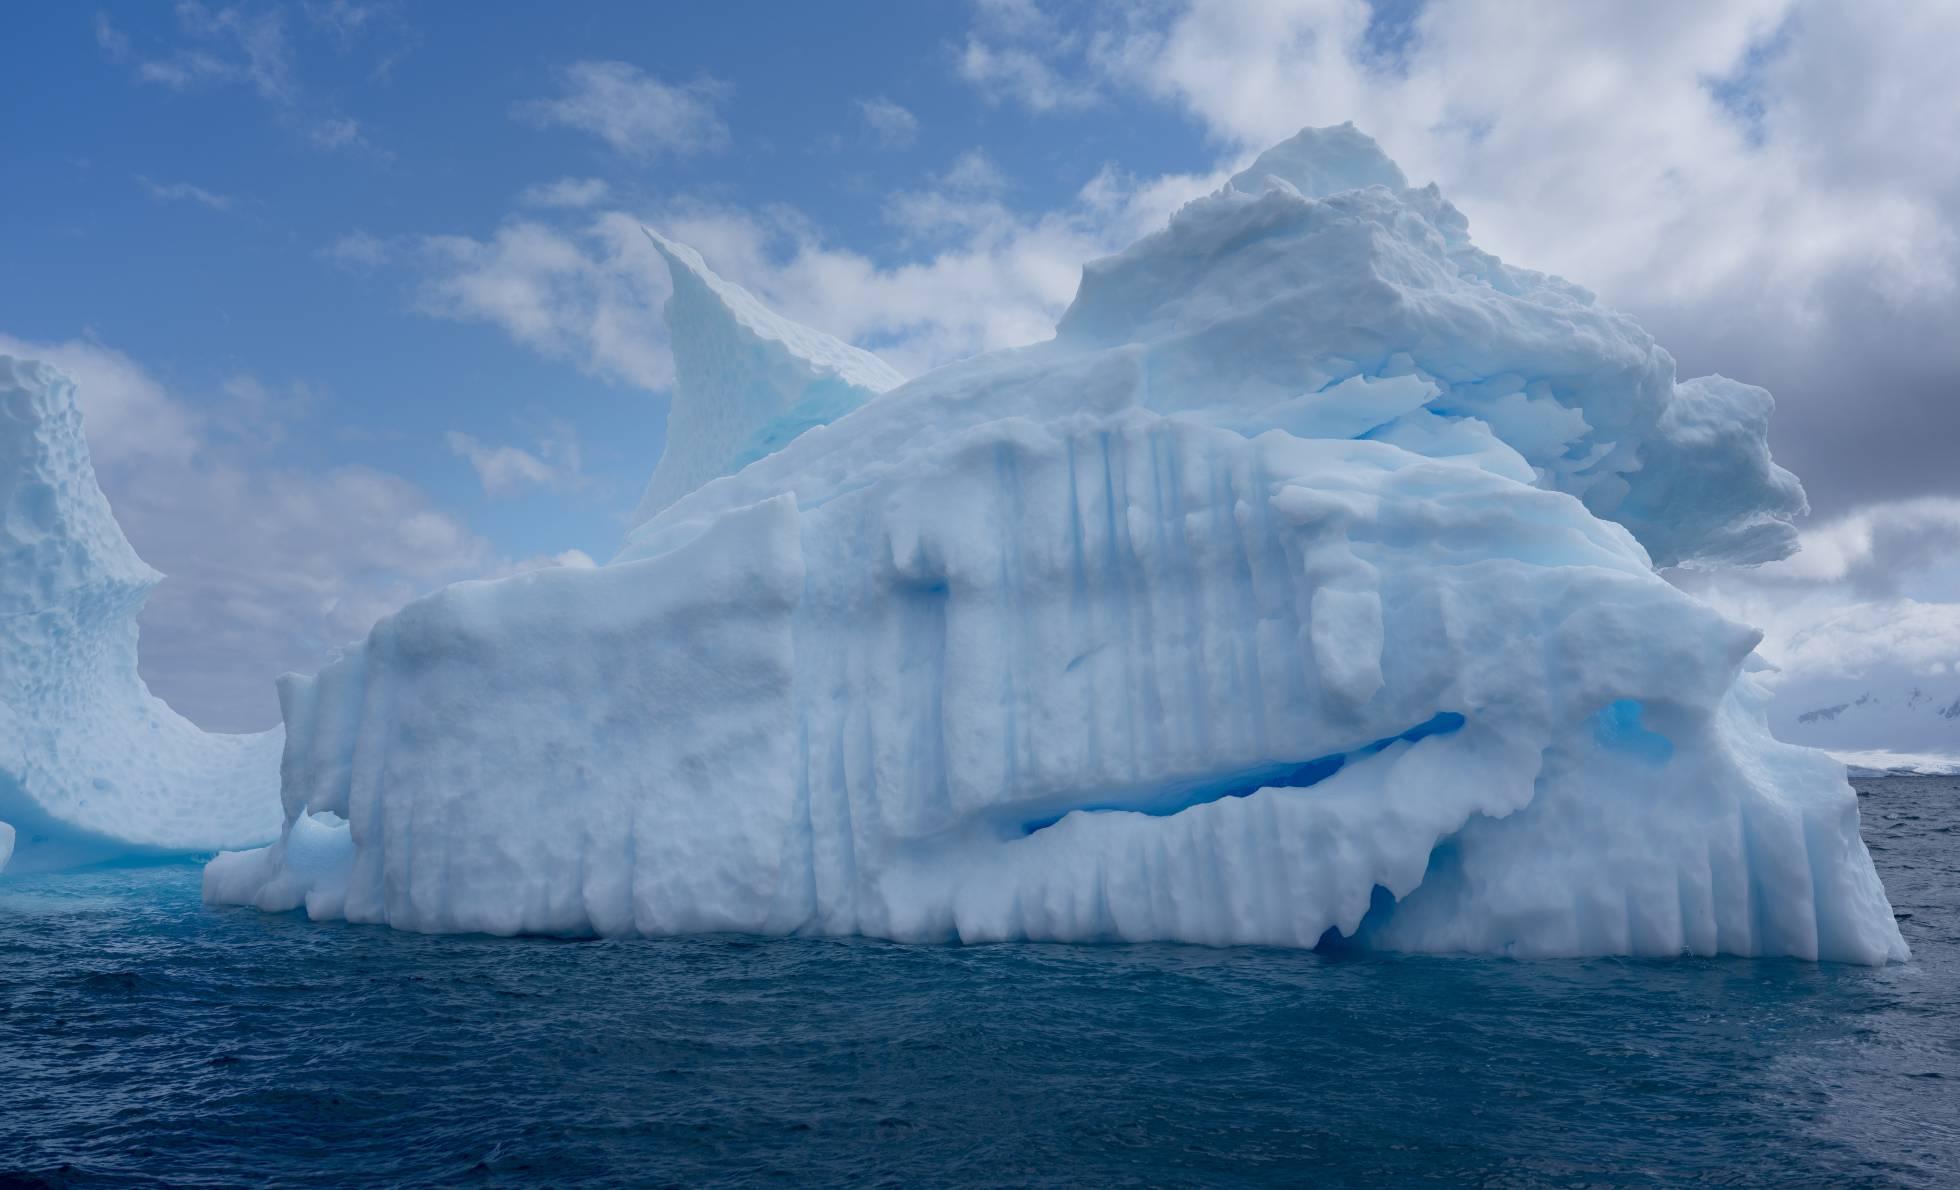 Un iceberg en la Antártida. ABBIE TRAYLER-SMITH (GREENPEACE)